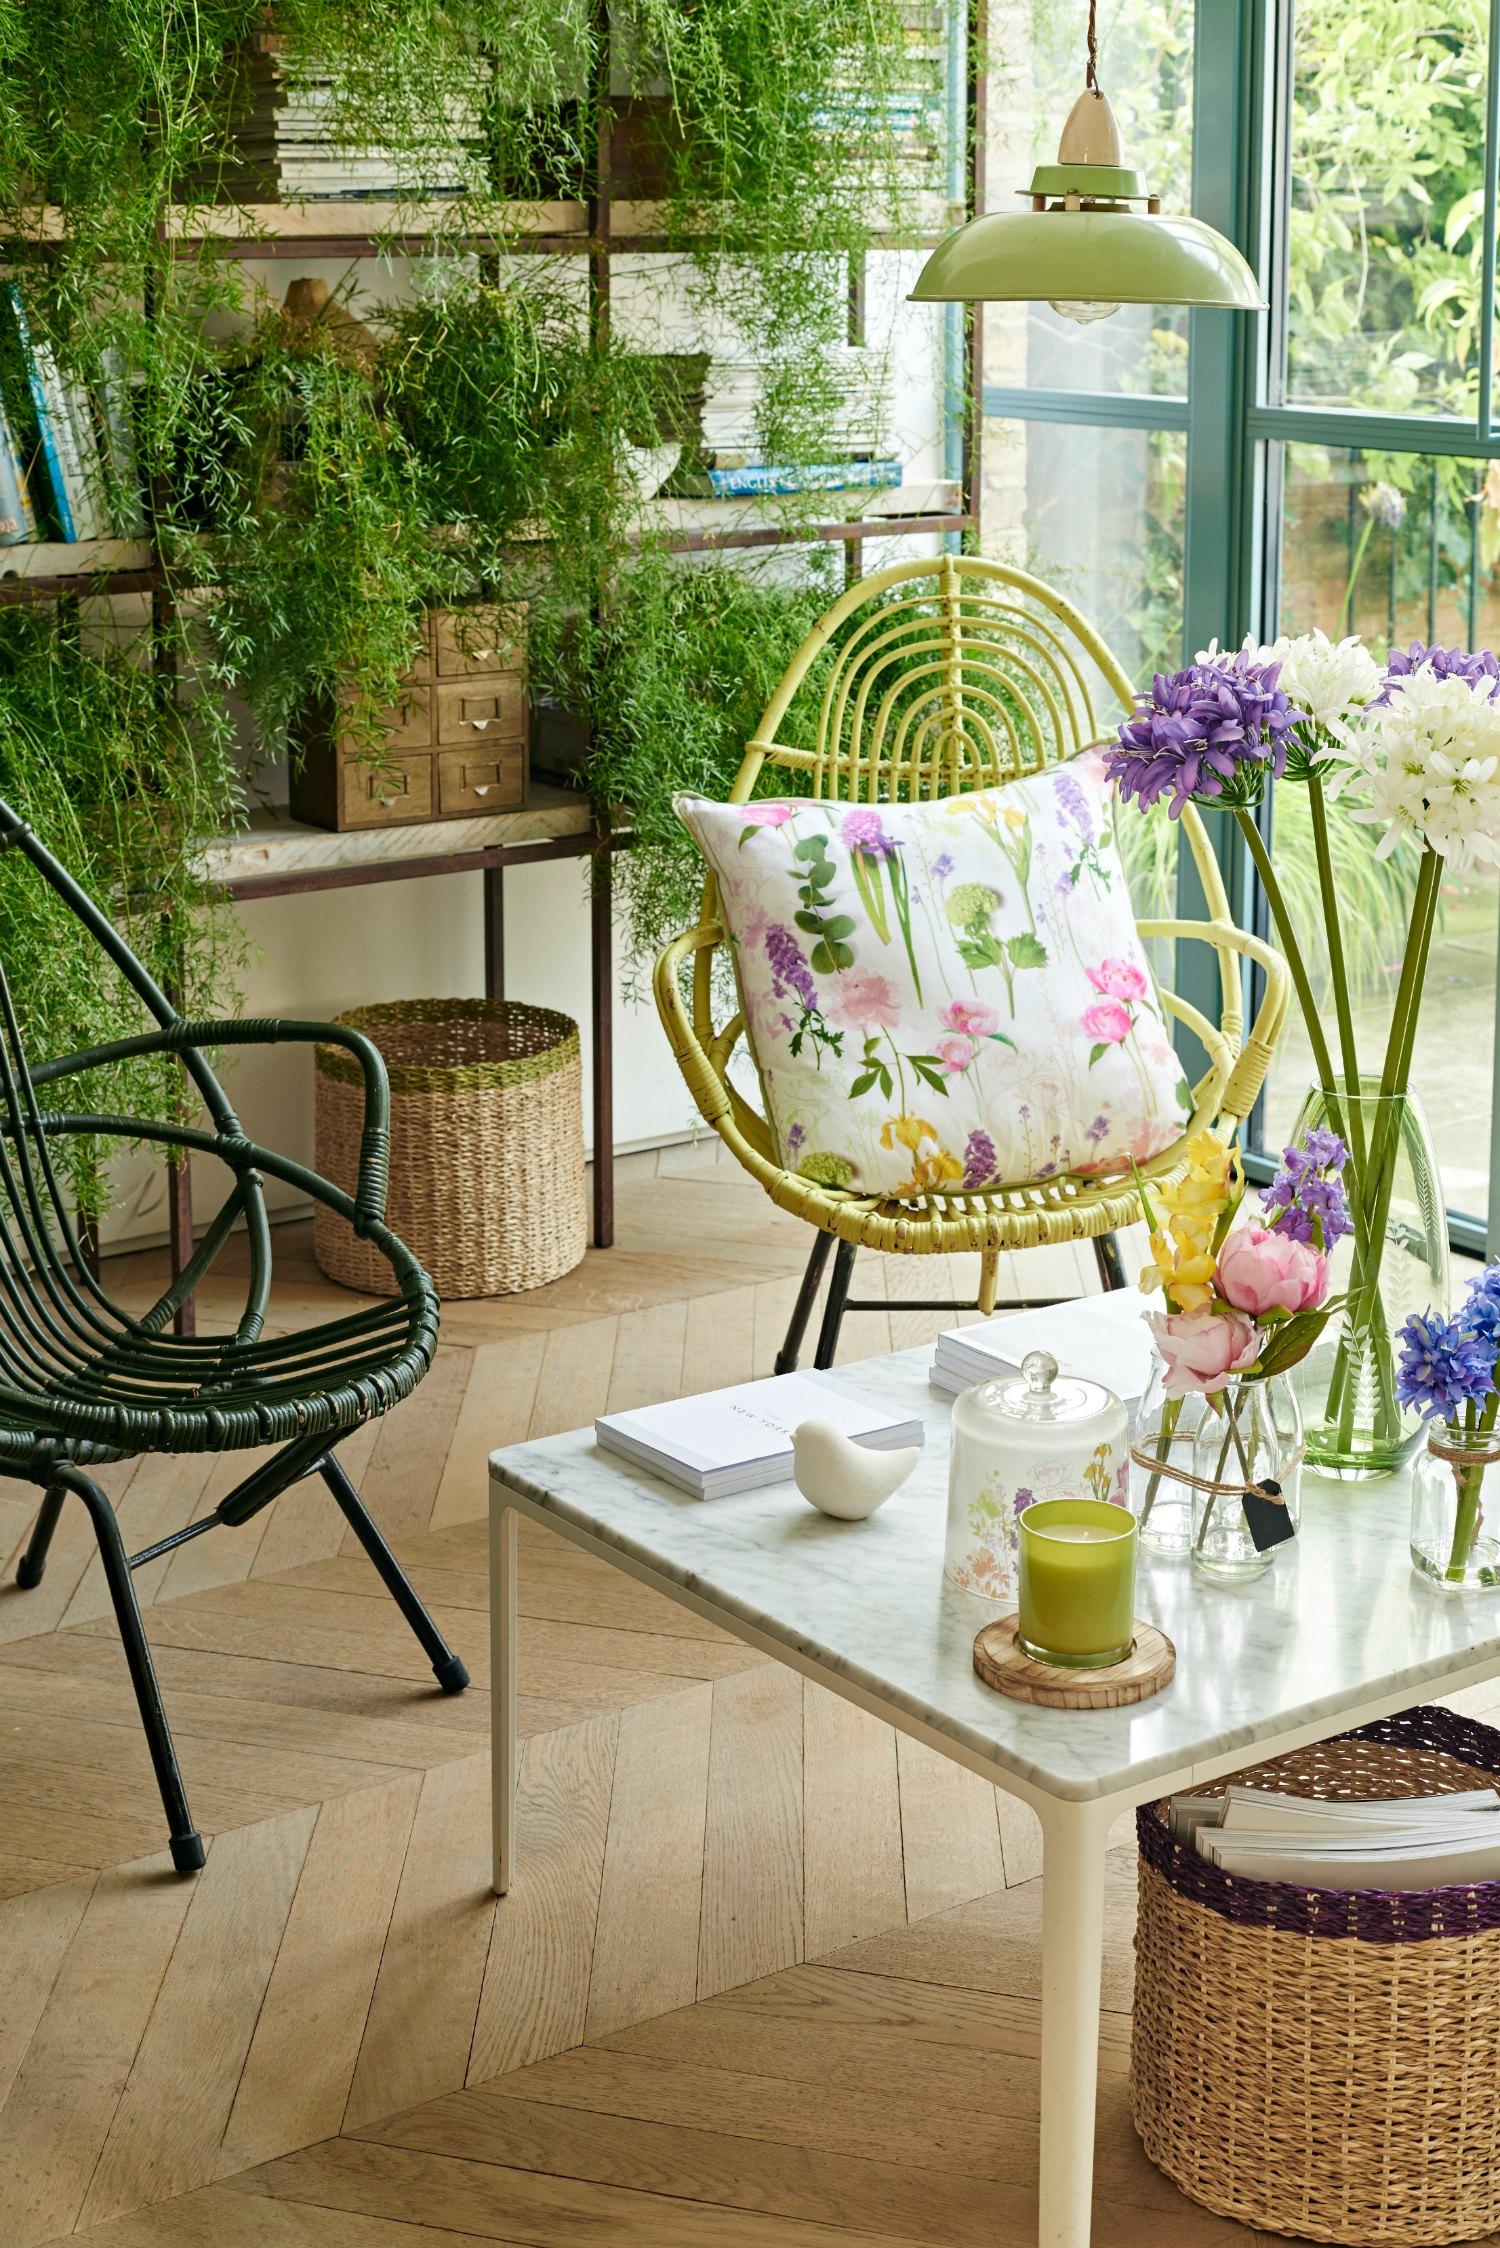 bringing the outdoors in sainsbury 39 s garden room range. Black Bedroom Furniture Sets. Home Design Ideas